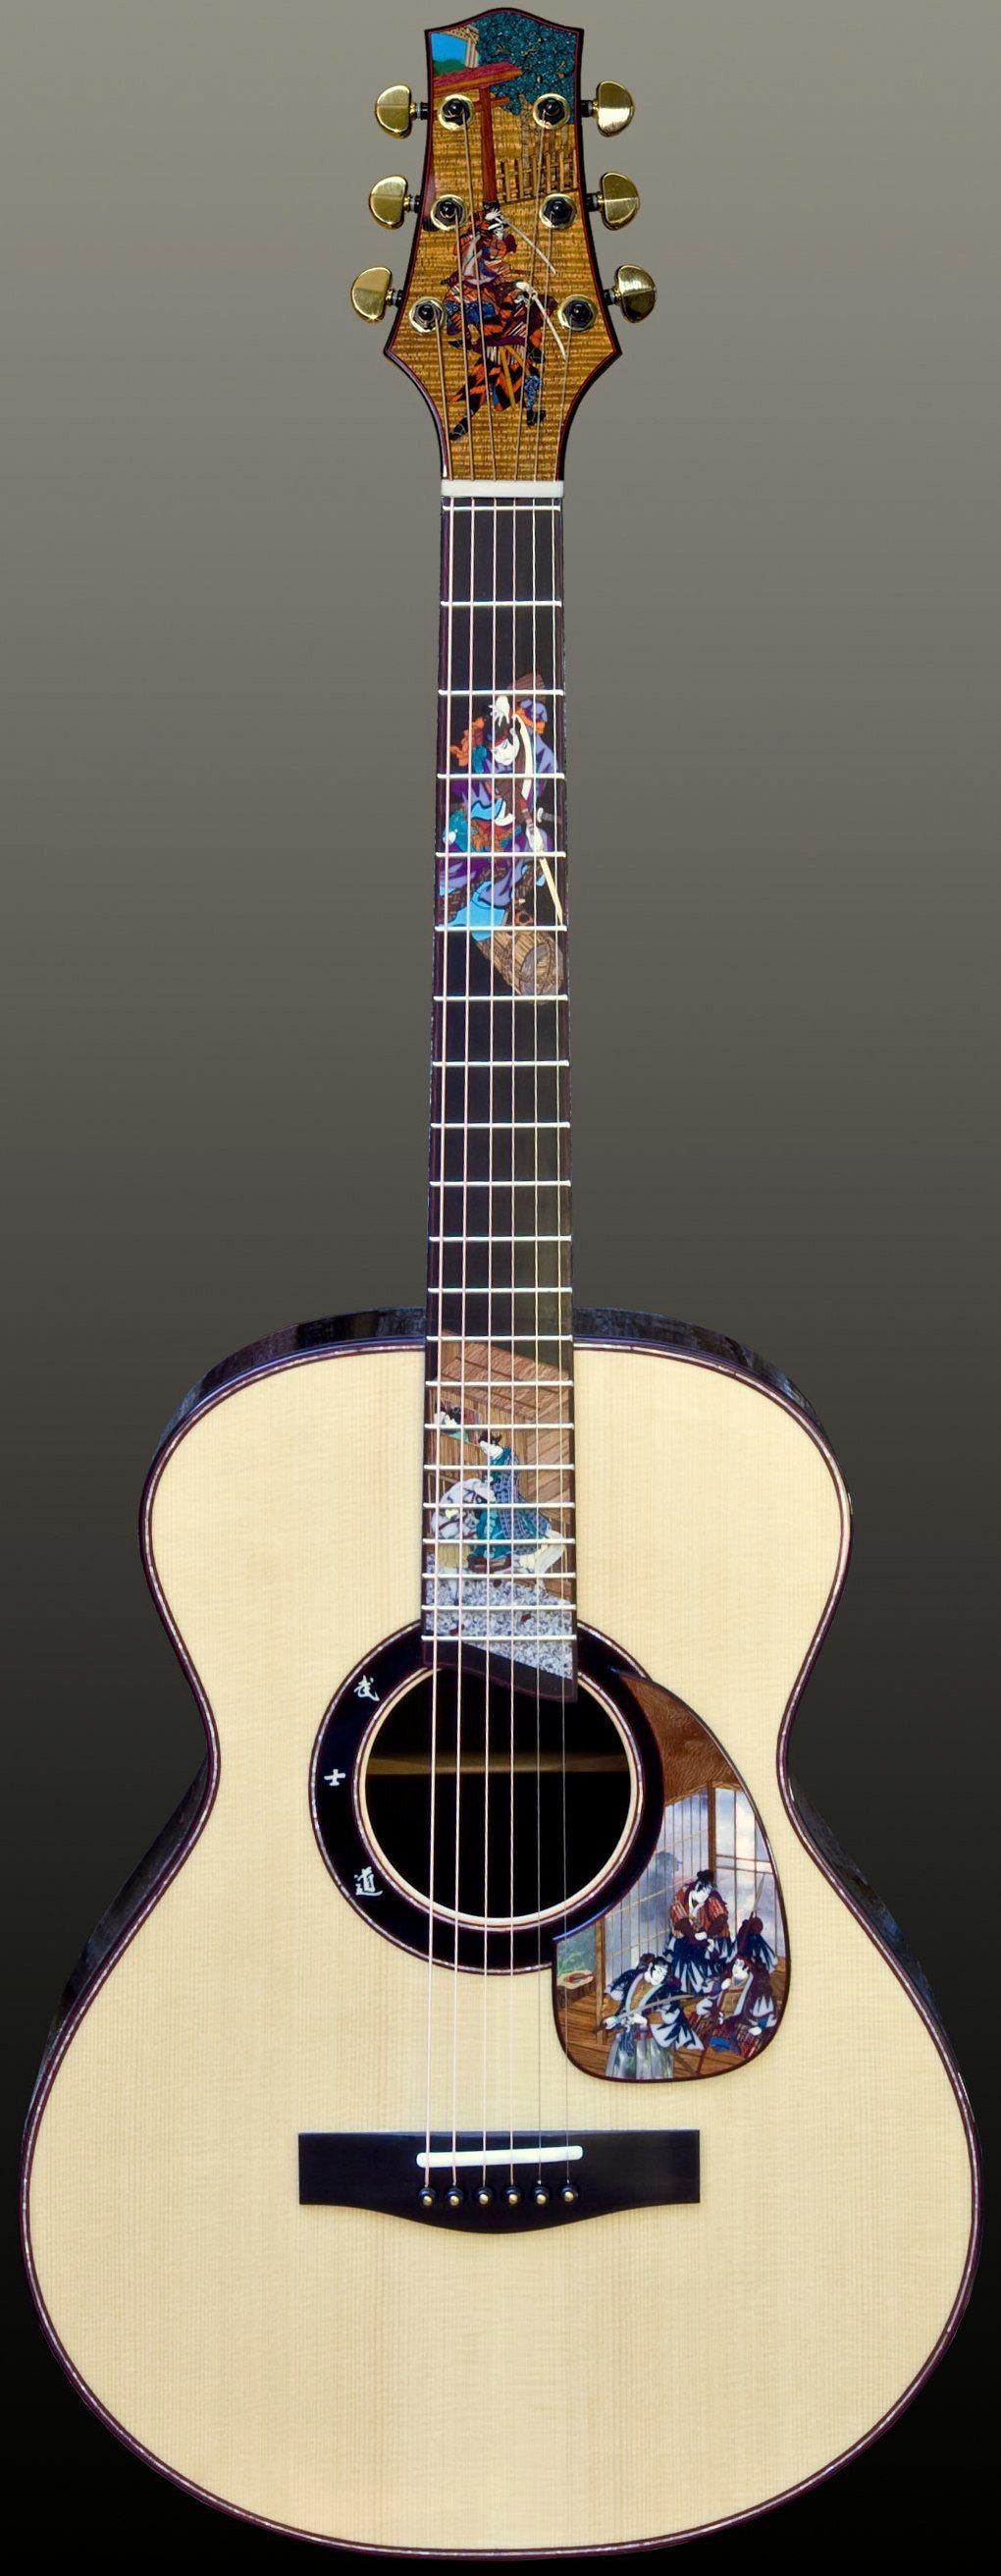 The 125 000 Voyage Air Guitar Https Www Pinterest Com Lardyfatboy Thats A Lot Of Money Guitar Acoustic Guitar Guitar Inlay